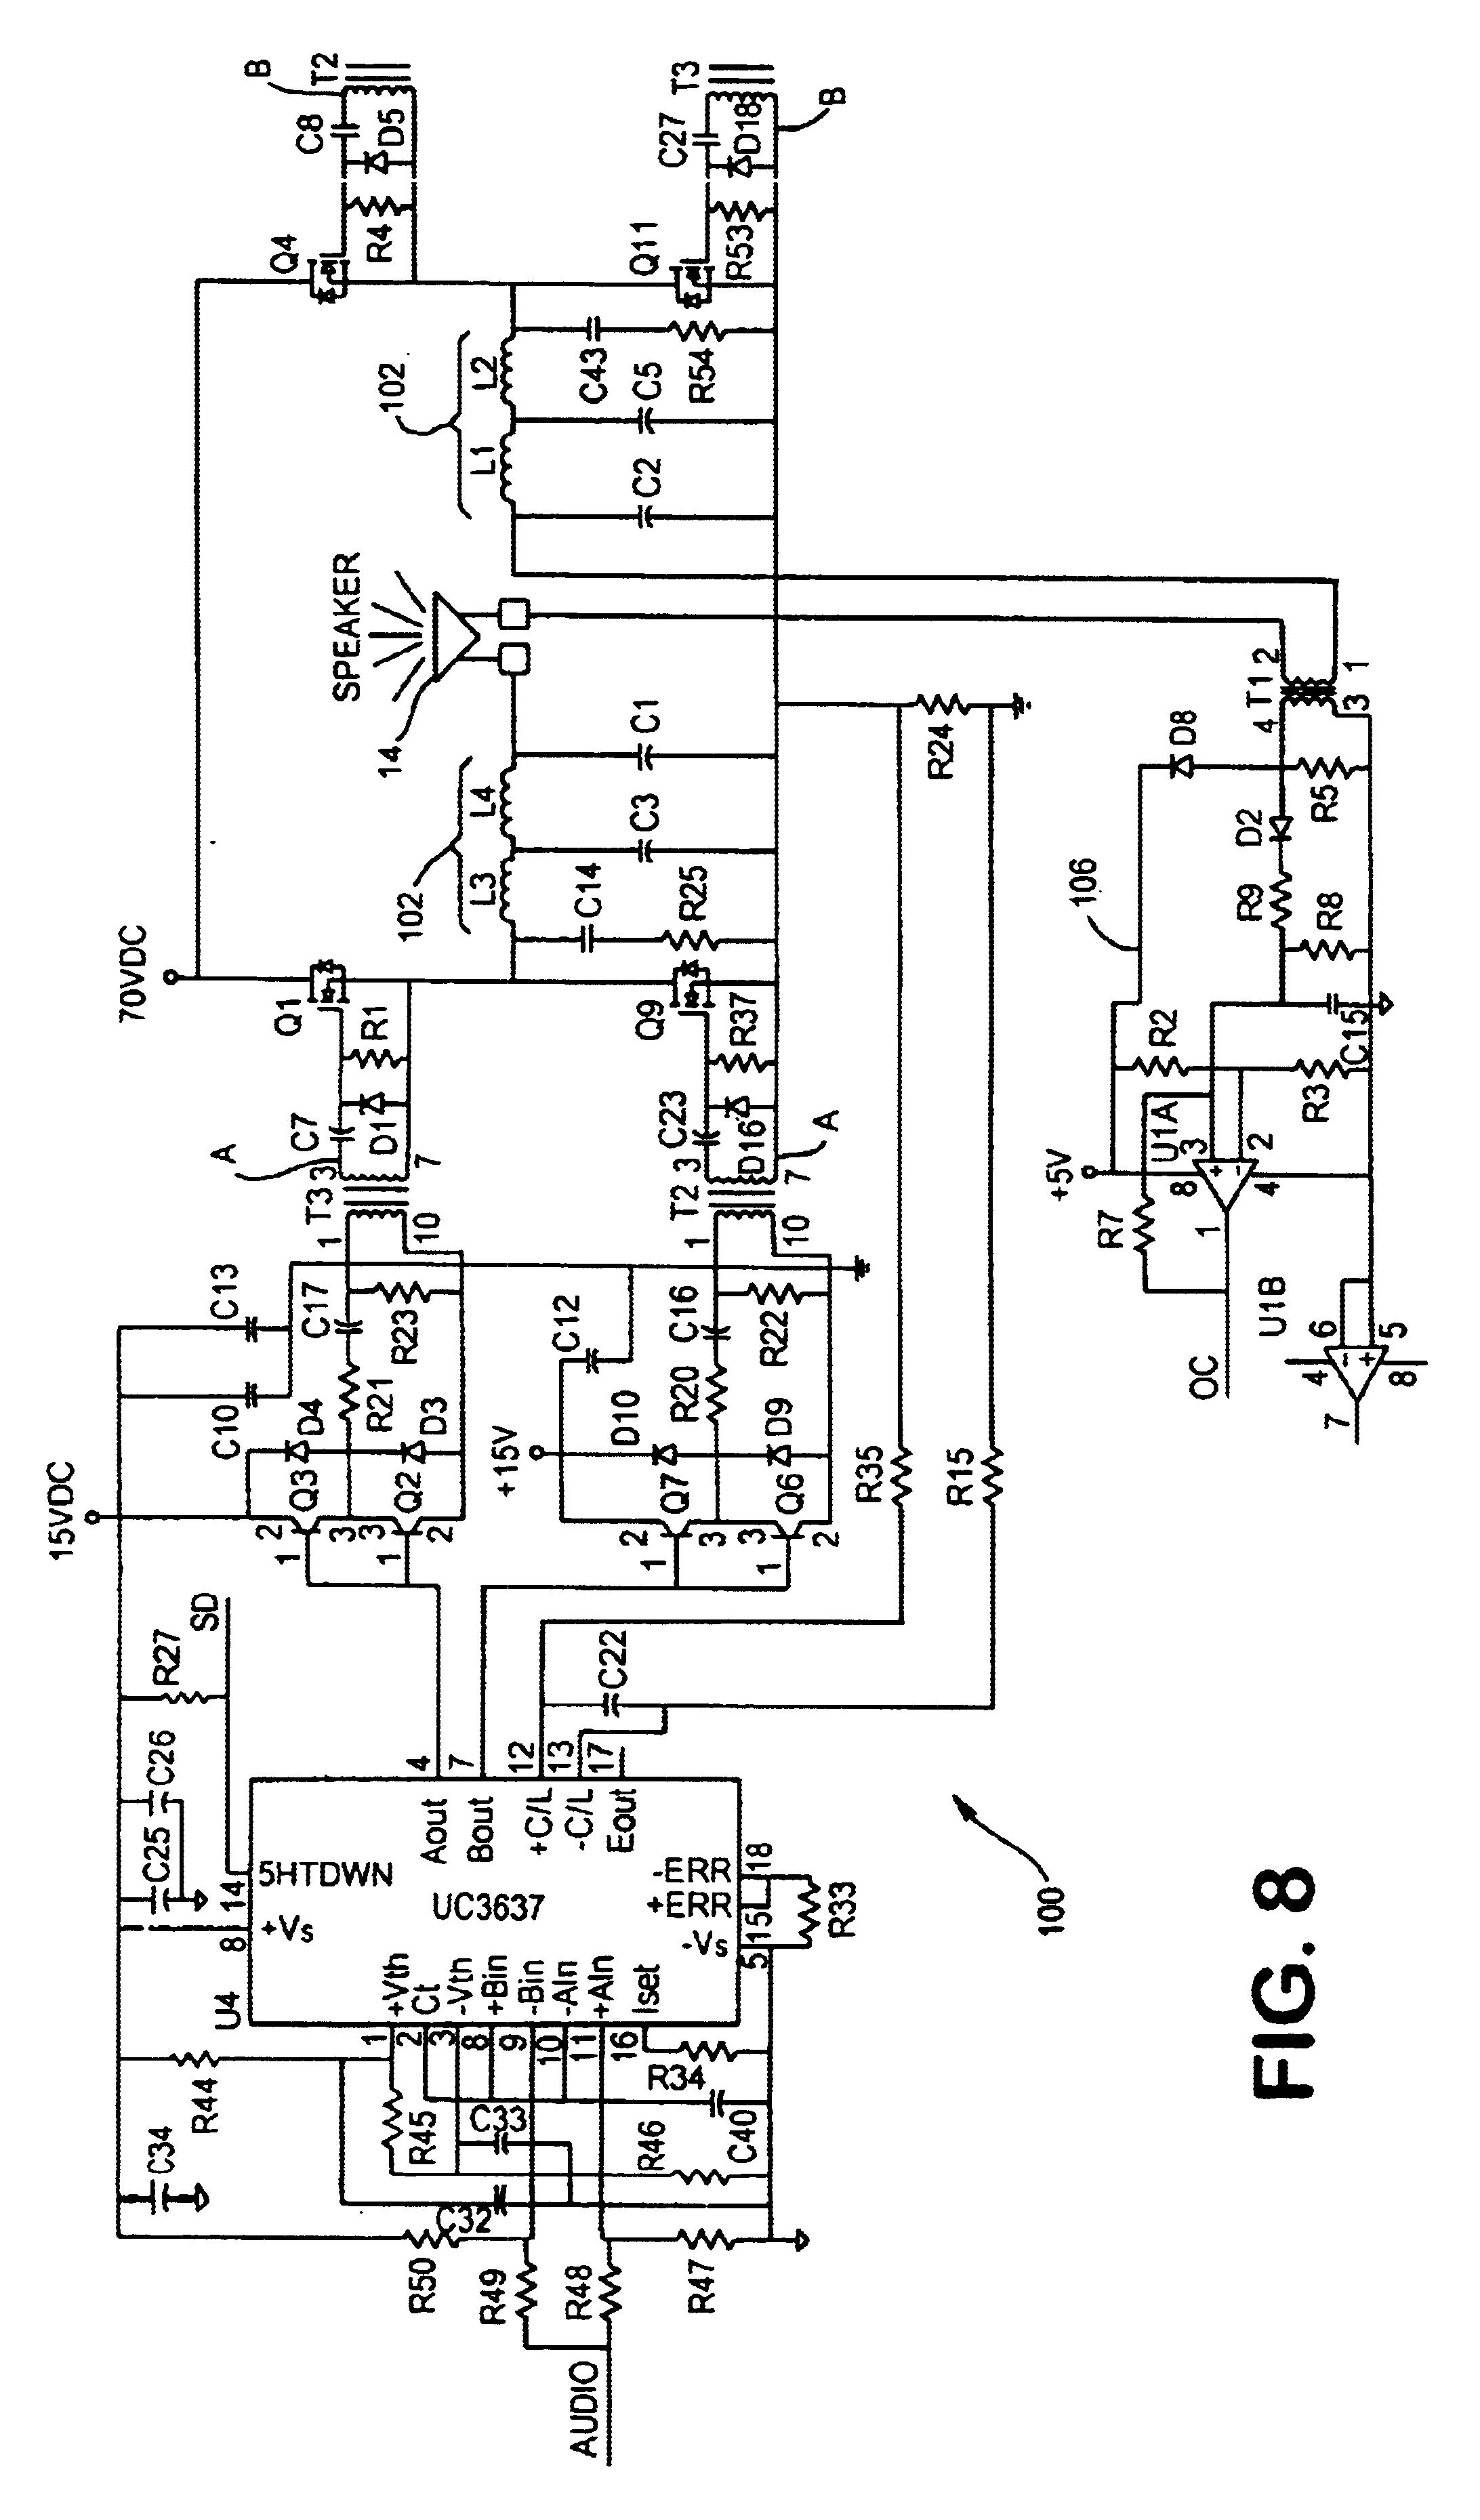 flashback wiring diagram image 5